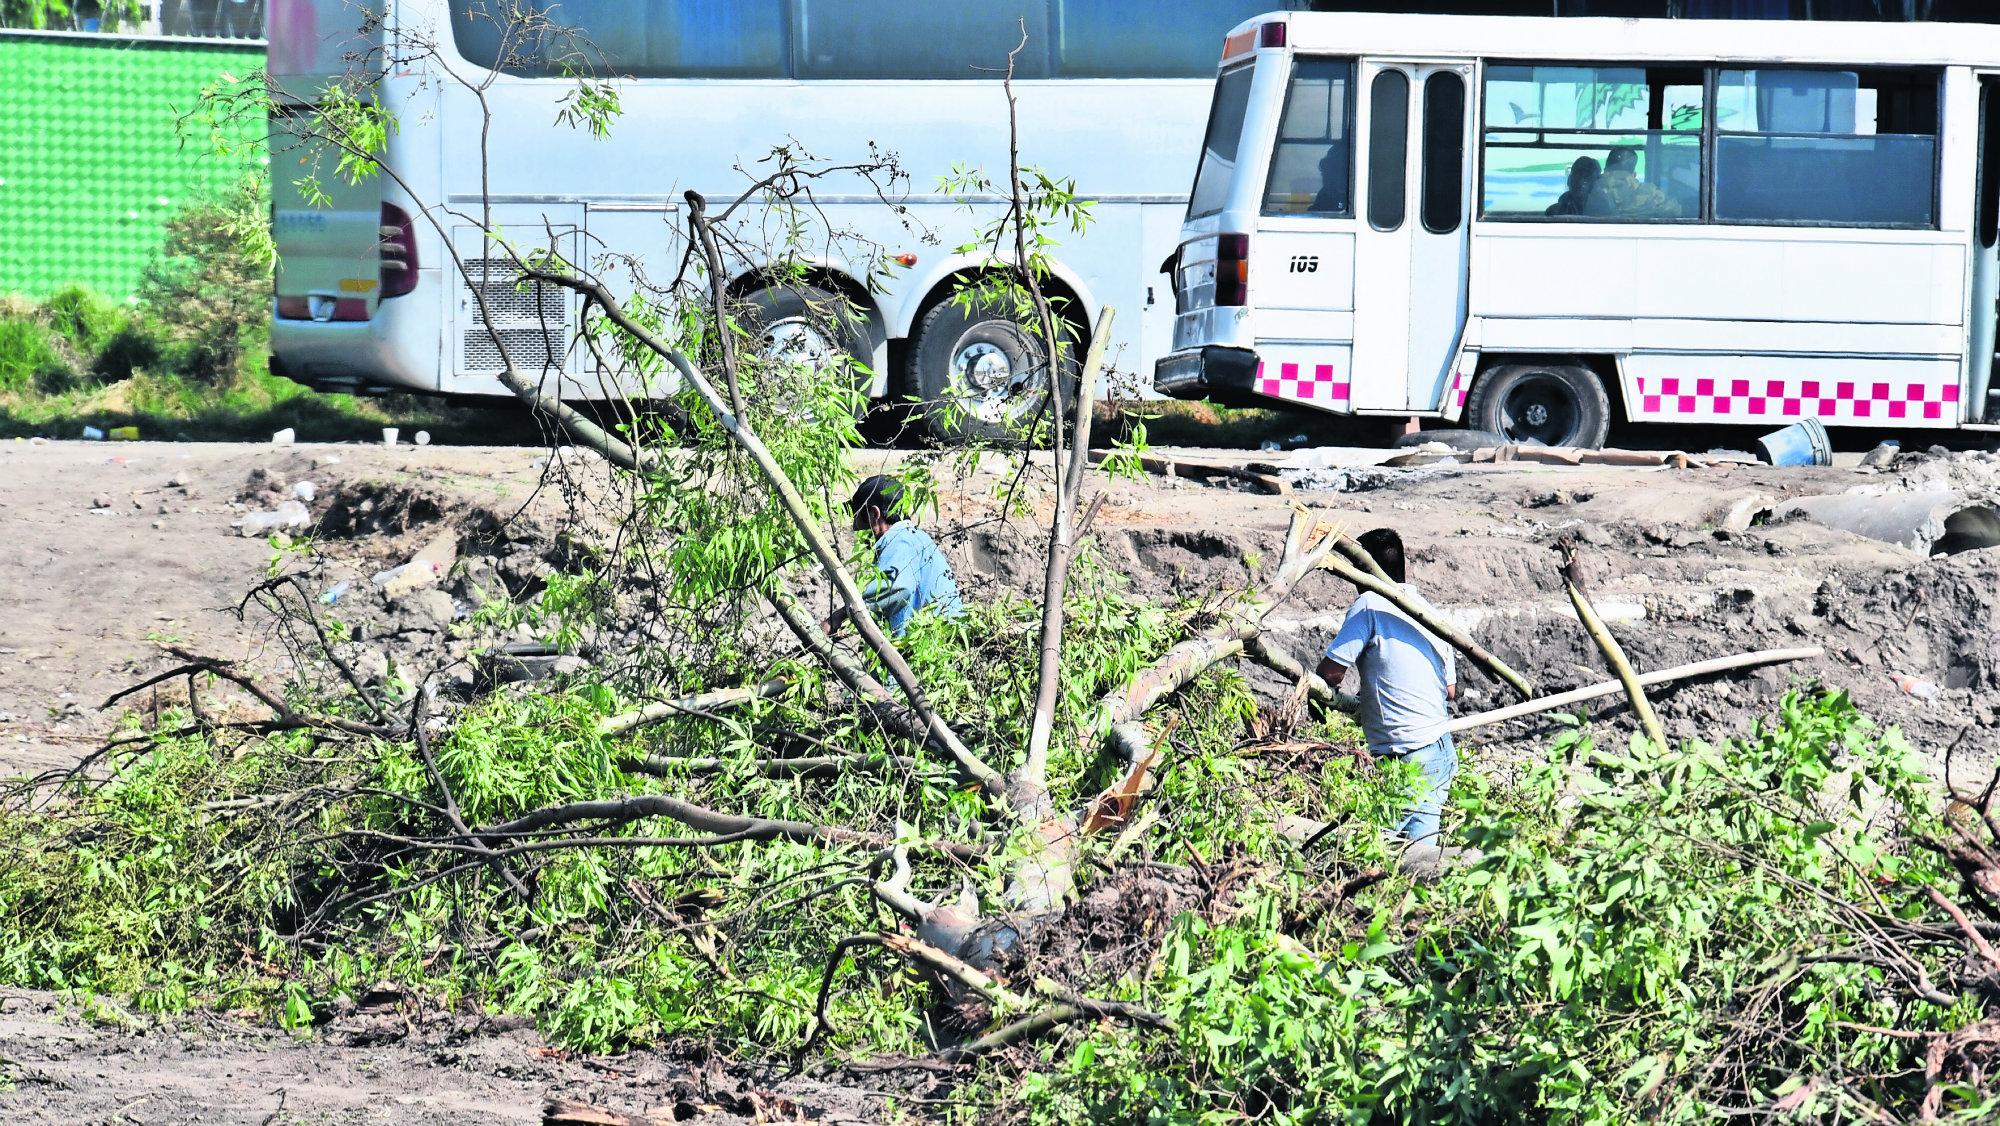 Contaminación del aire Talan árboles Centro comercial Edomex Toluca